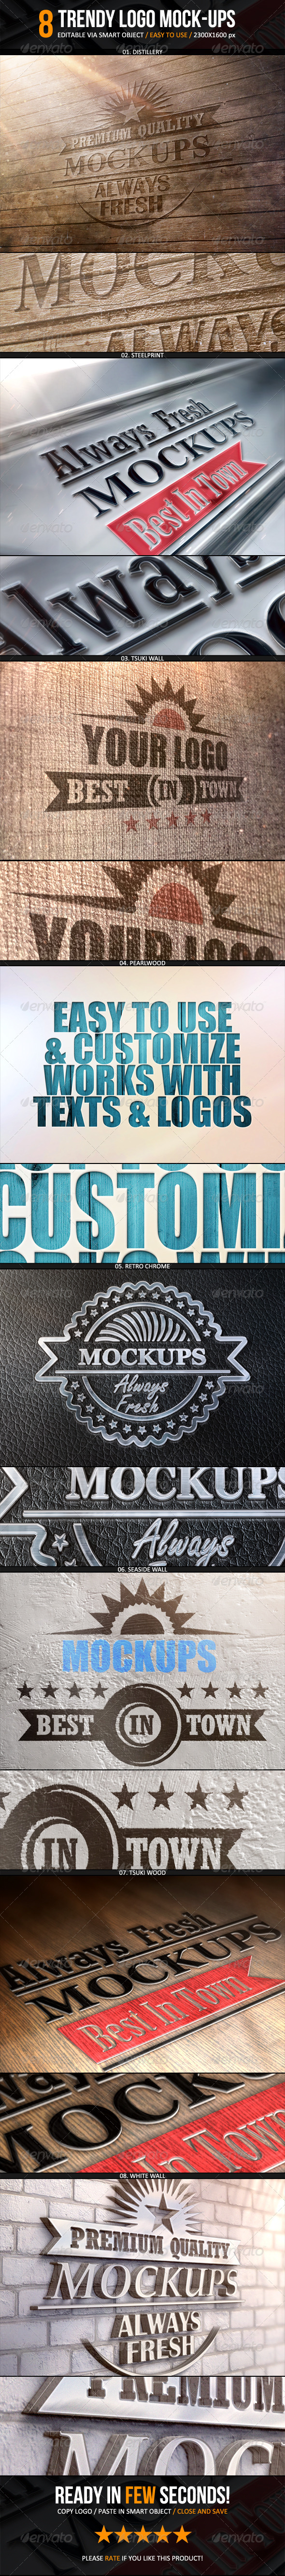 Trendy Logo Mockup - 8 Smart Templates - Logo Product Mock-Ups